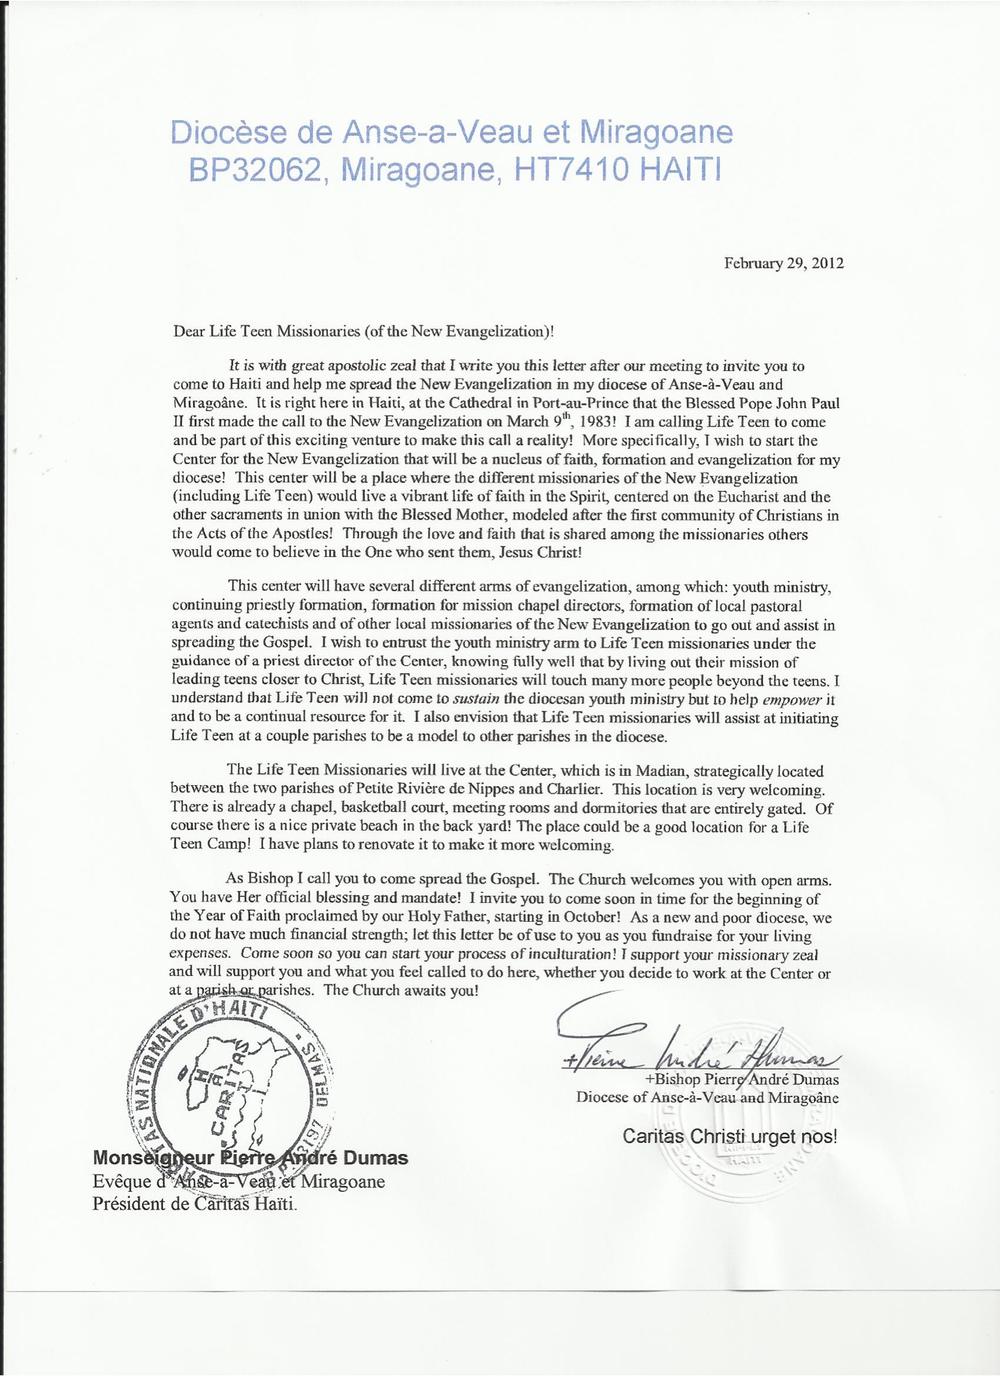 Msgr. Dumas's invitation to Haiti!